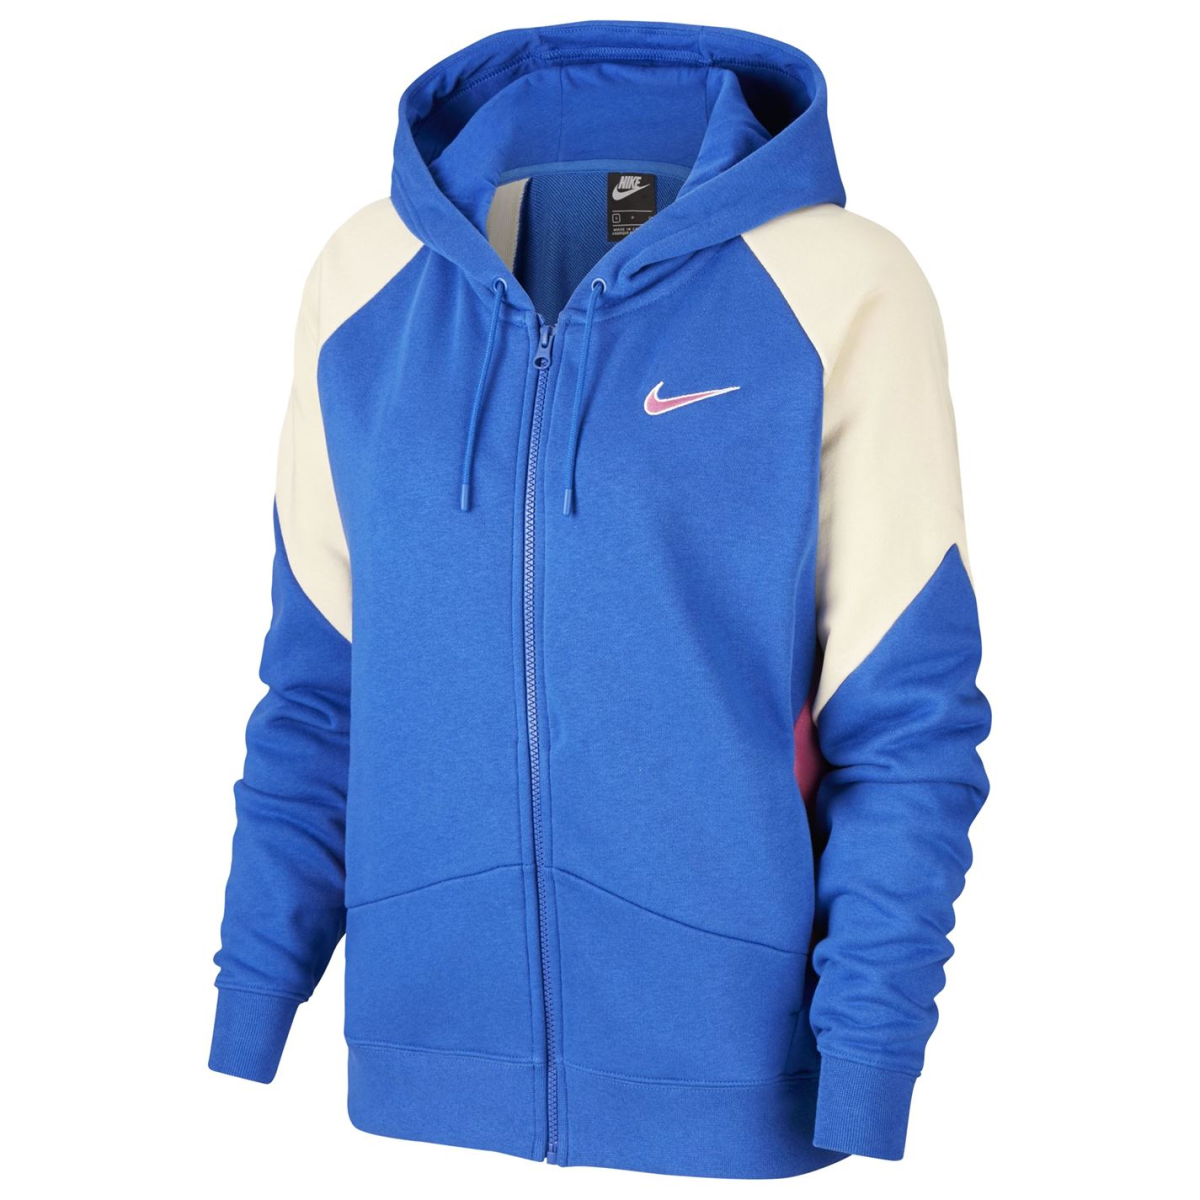 Nike Kapuzenjacke Jacke Damen Sweatshirt Kapuzenpullover Pullover 2131